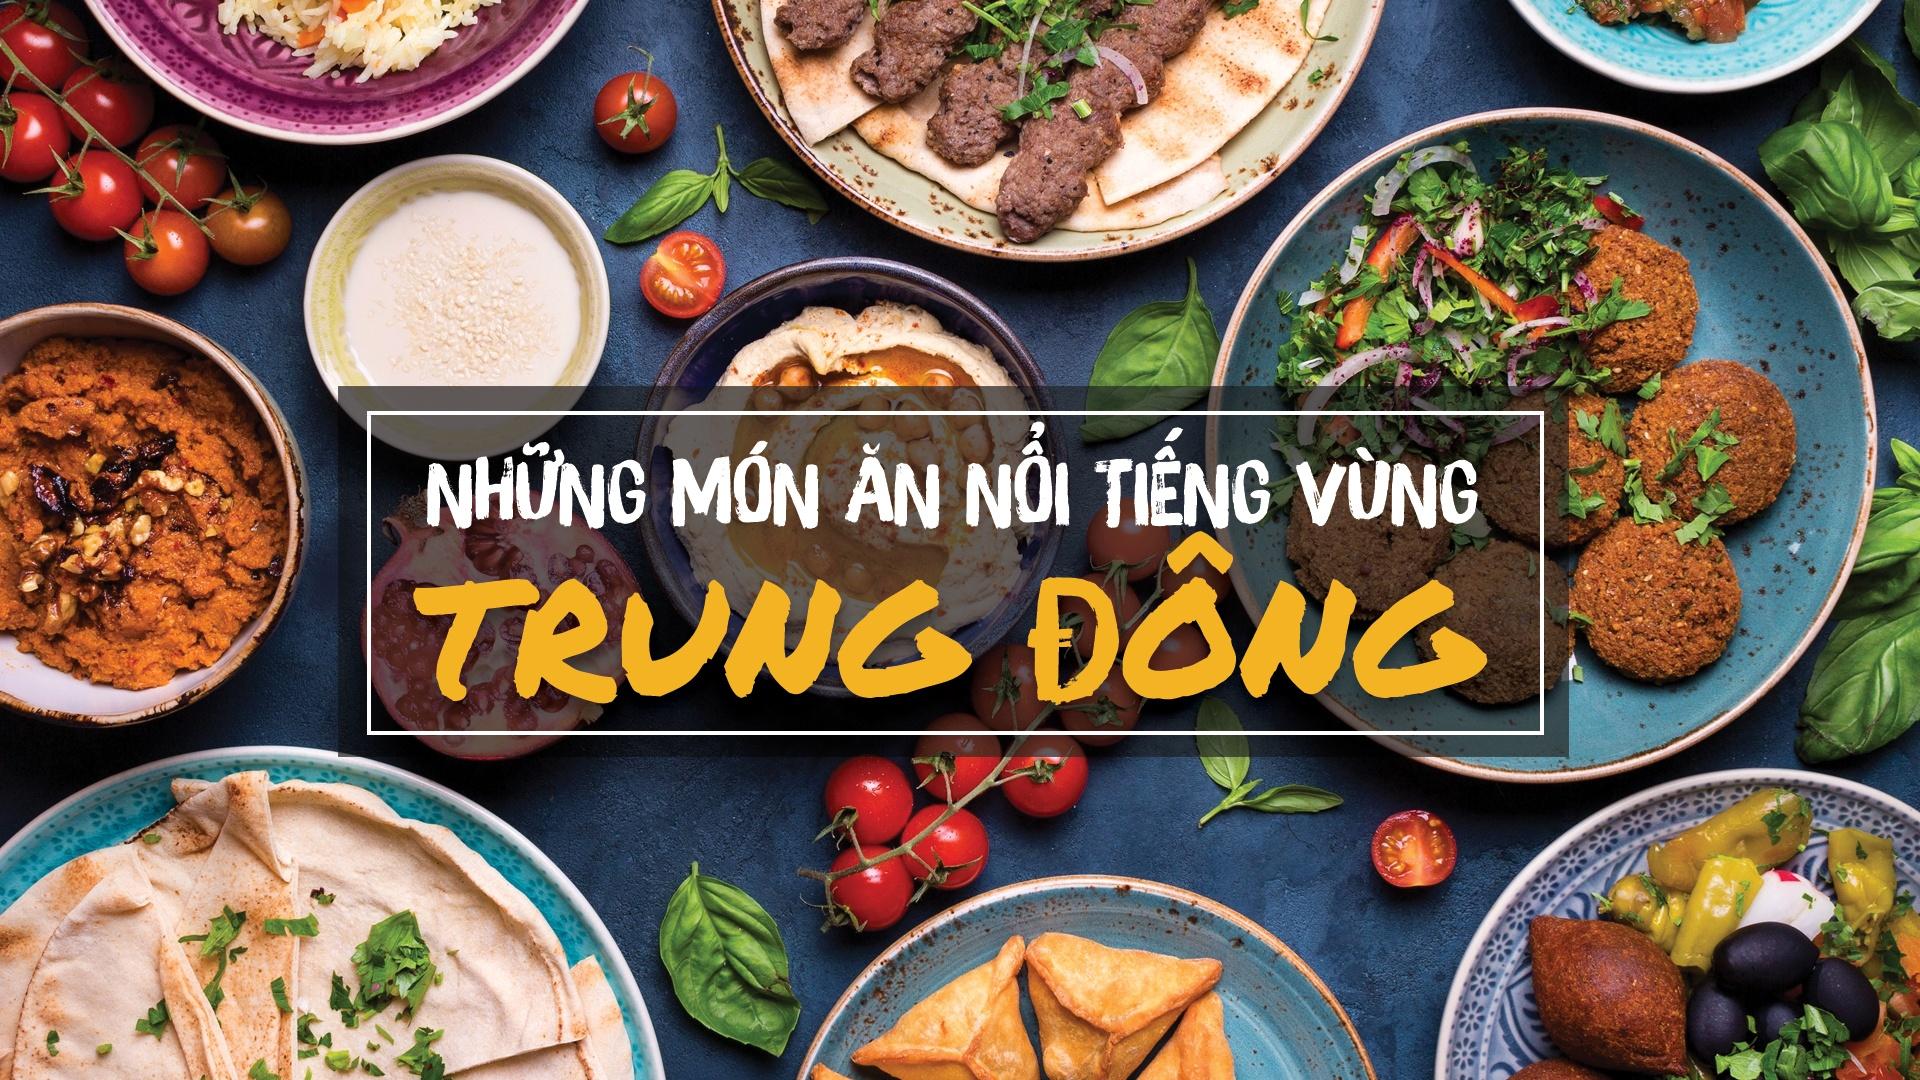 am thuc Trung Dong anh 1